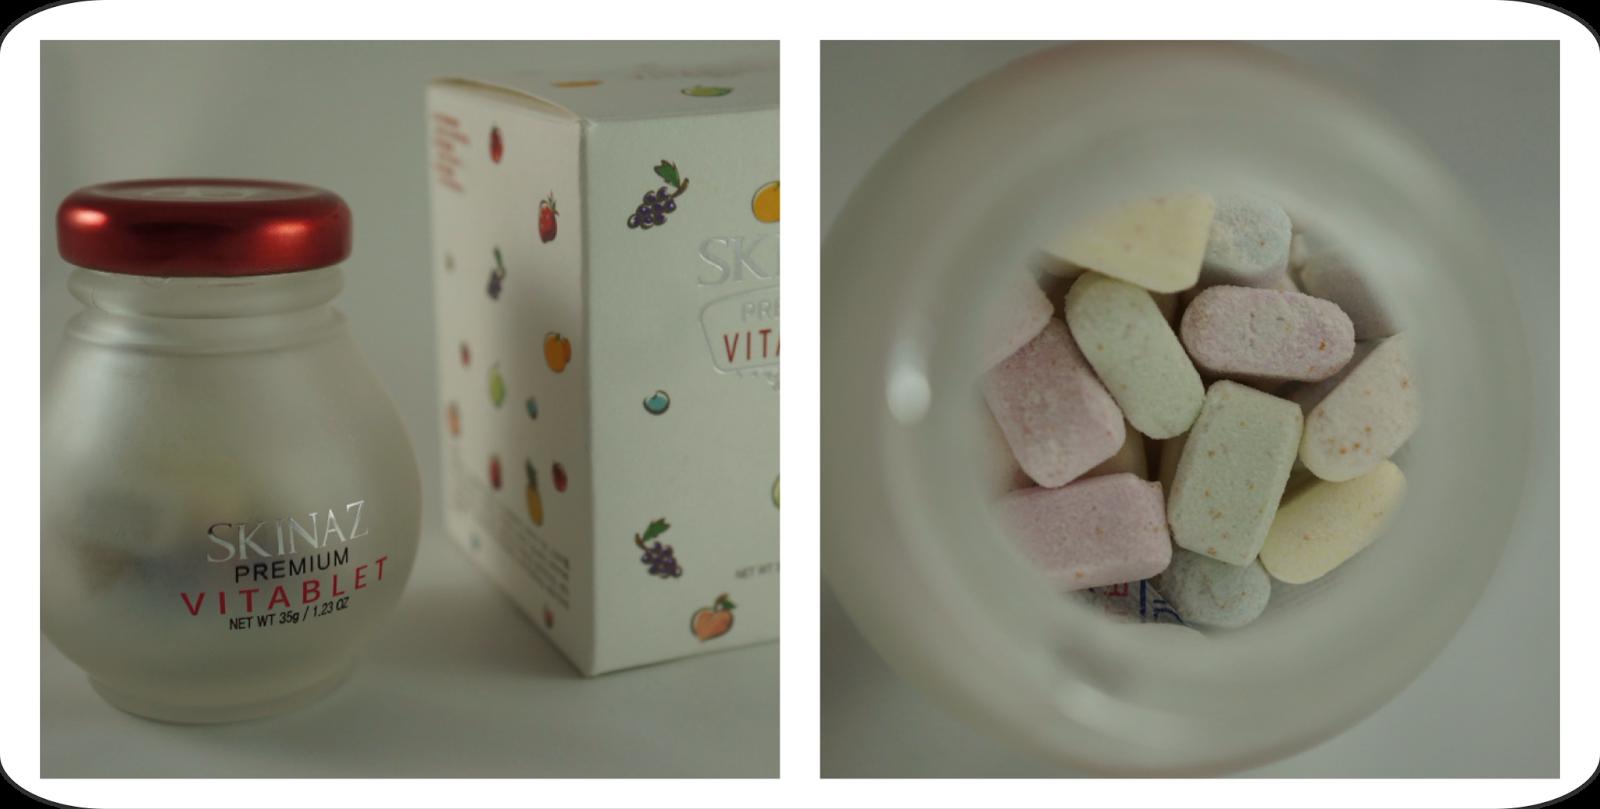 Memebox Special #16 OMG Box Unboxing Review SKINAZ Premium Vitatablet Vitamin Tablet